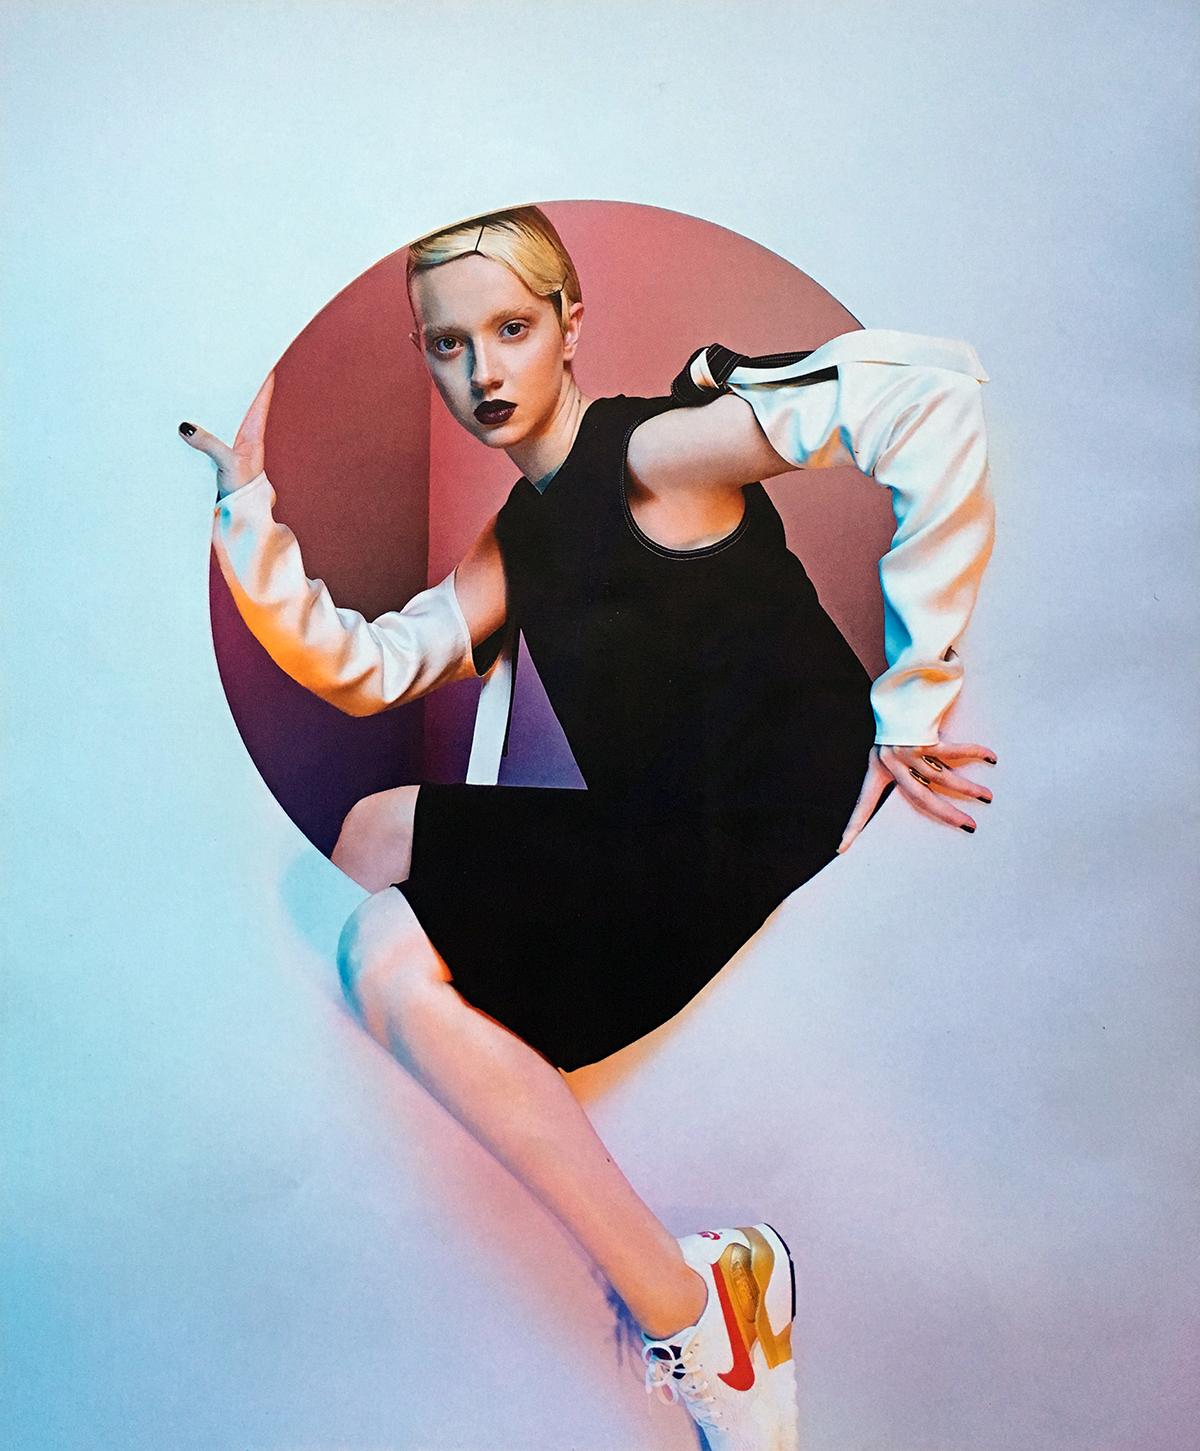 Harpers BazaarSrb Aug 2016 Jovana Djuric 08.jpg